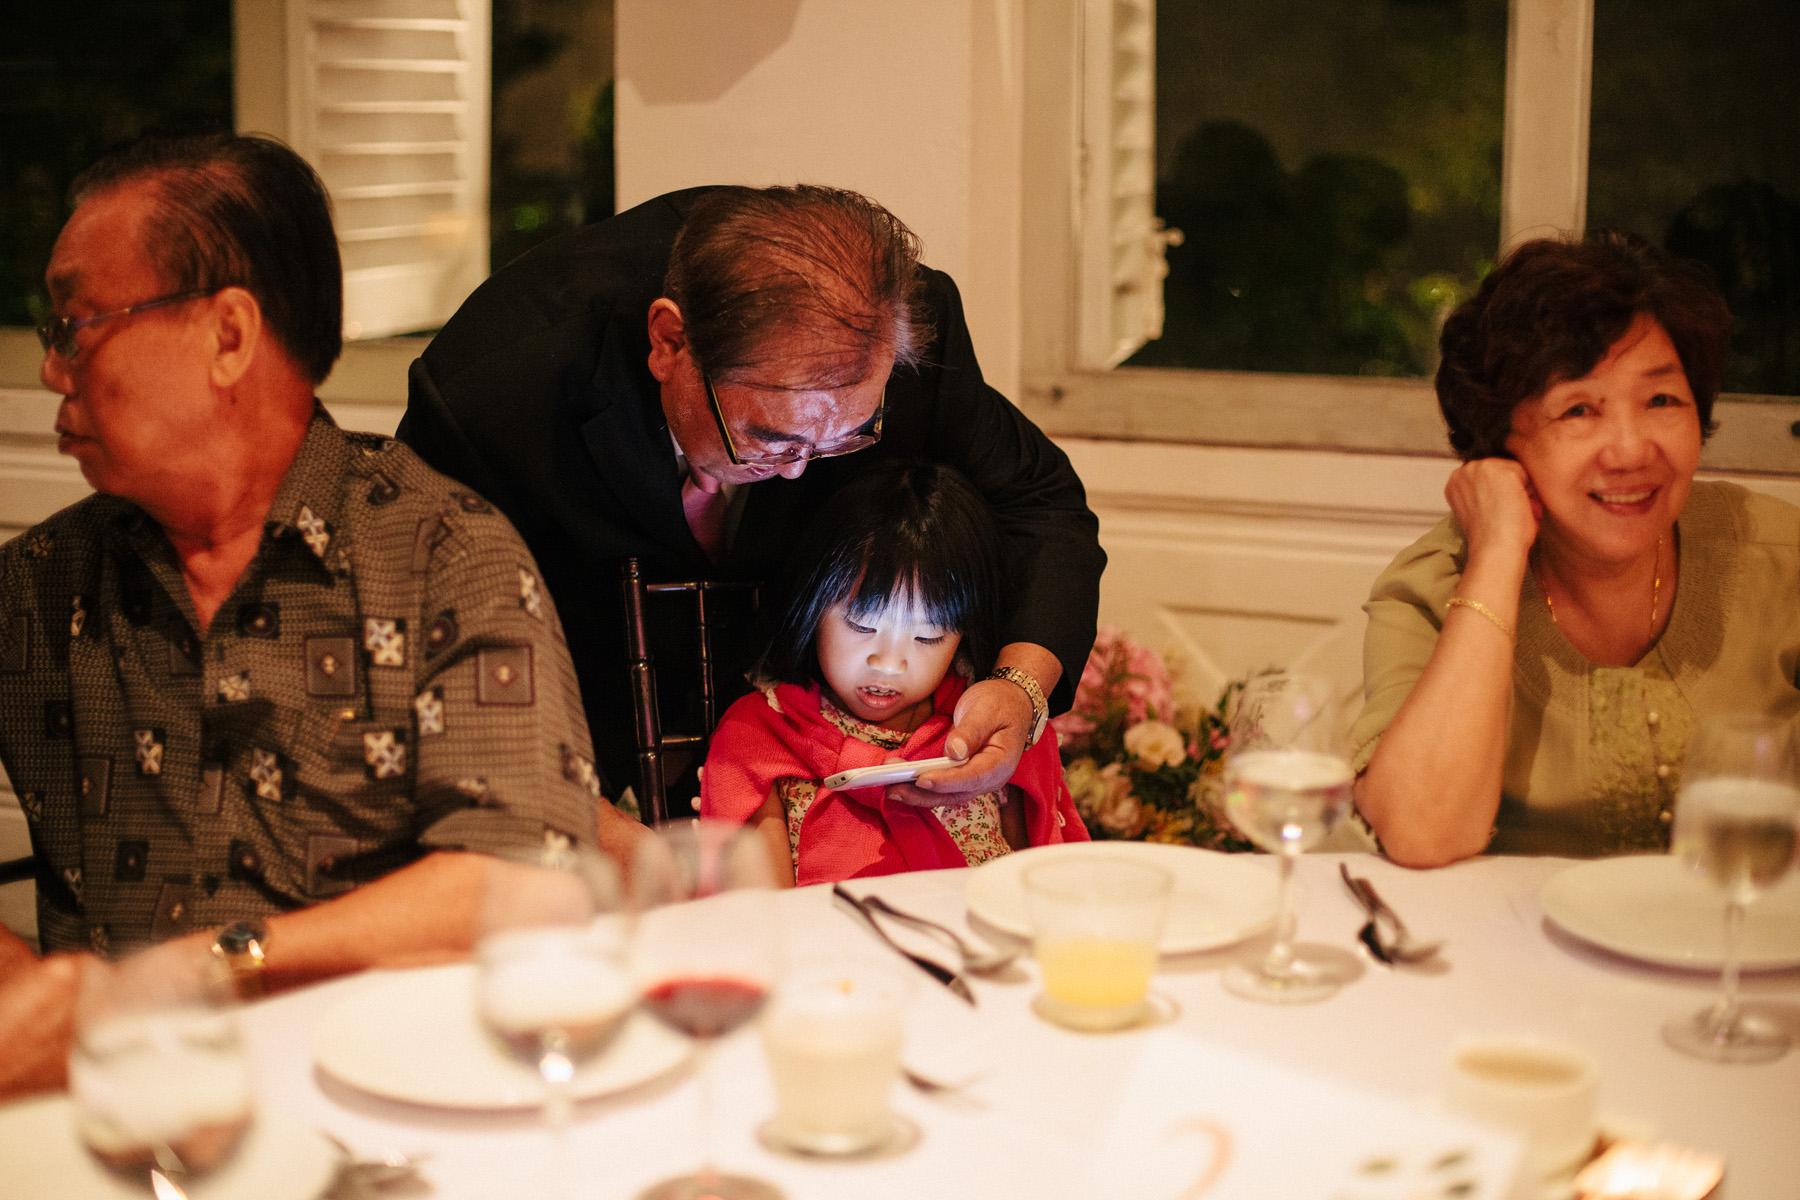 singapore-wedding-travel-photographer-faith-alvin-wedding-wmt-50.jpg